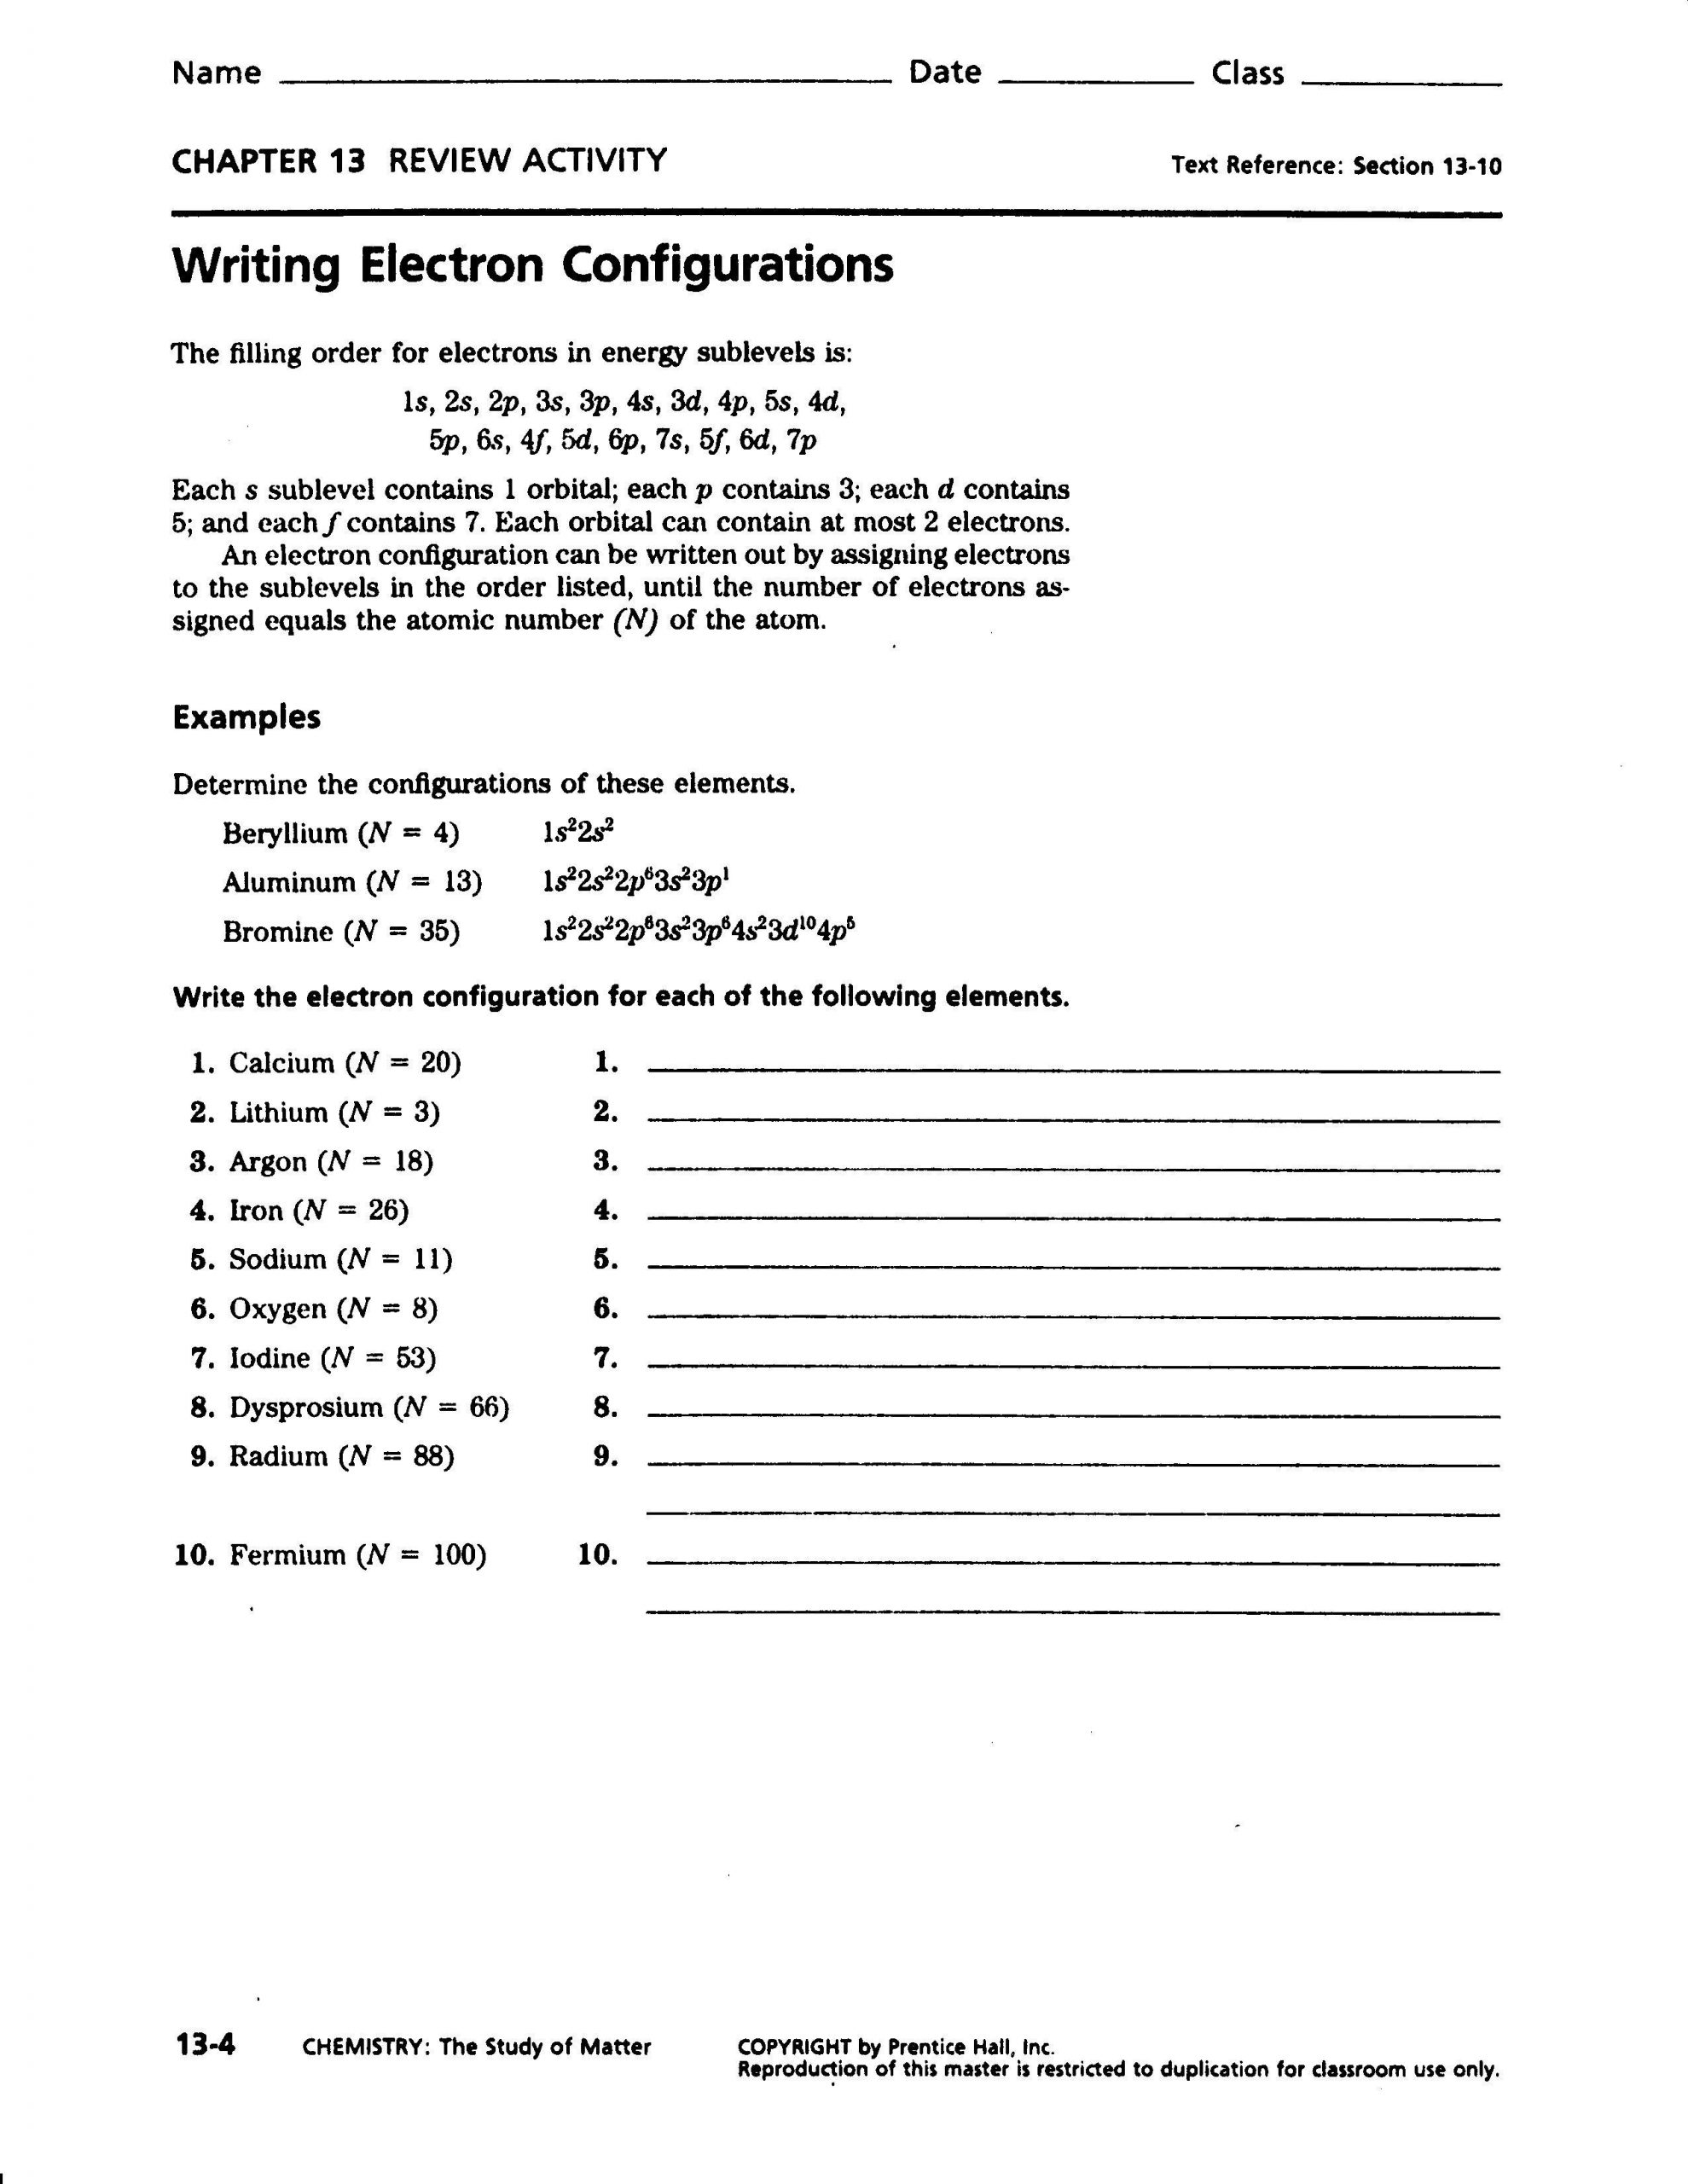 Electron Configuration Practice Worksheet Electron Configurations and the Periodic Table Practice